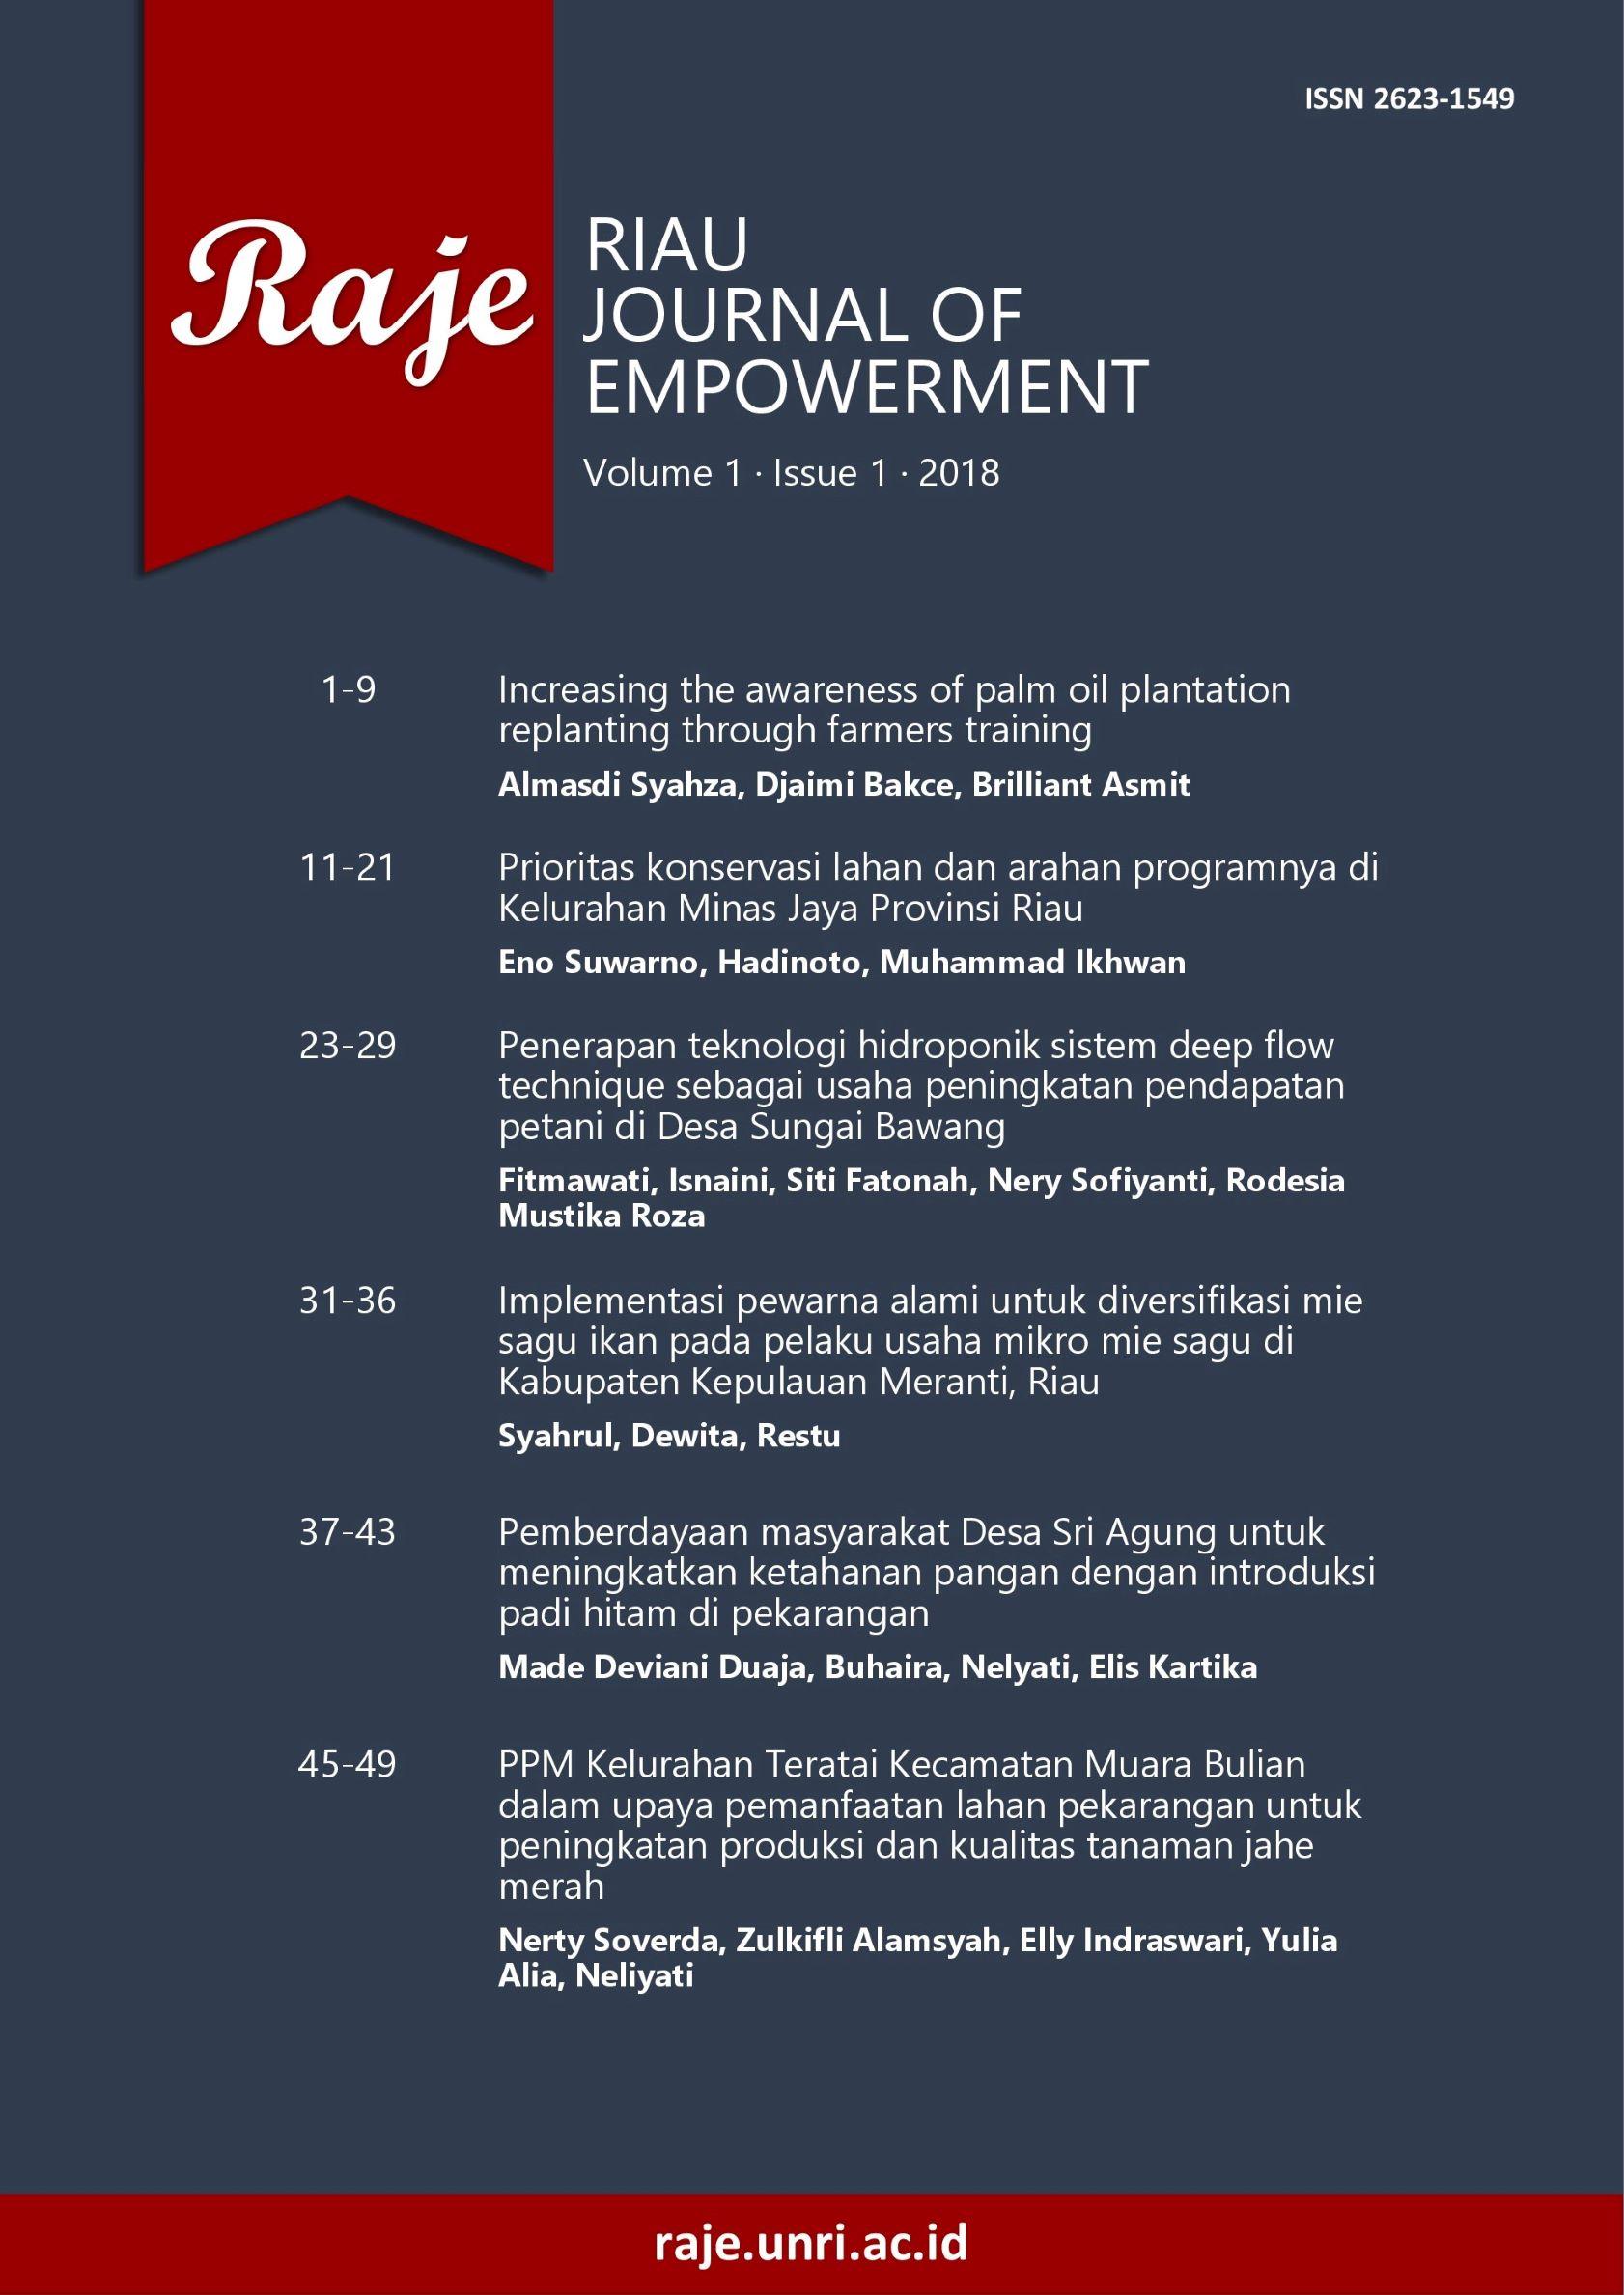 Riau Journal of Empowerment 1(1) 2018